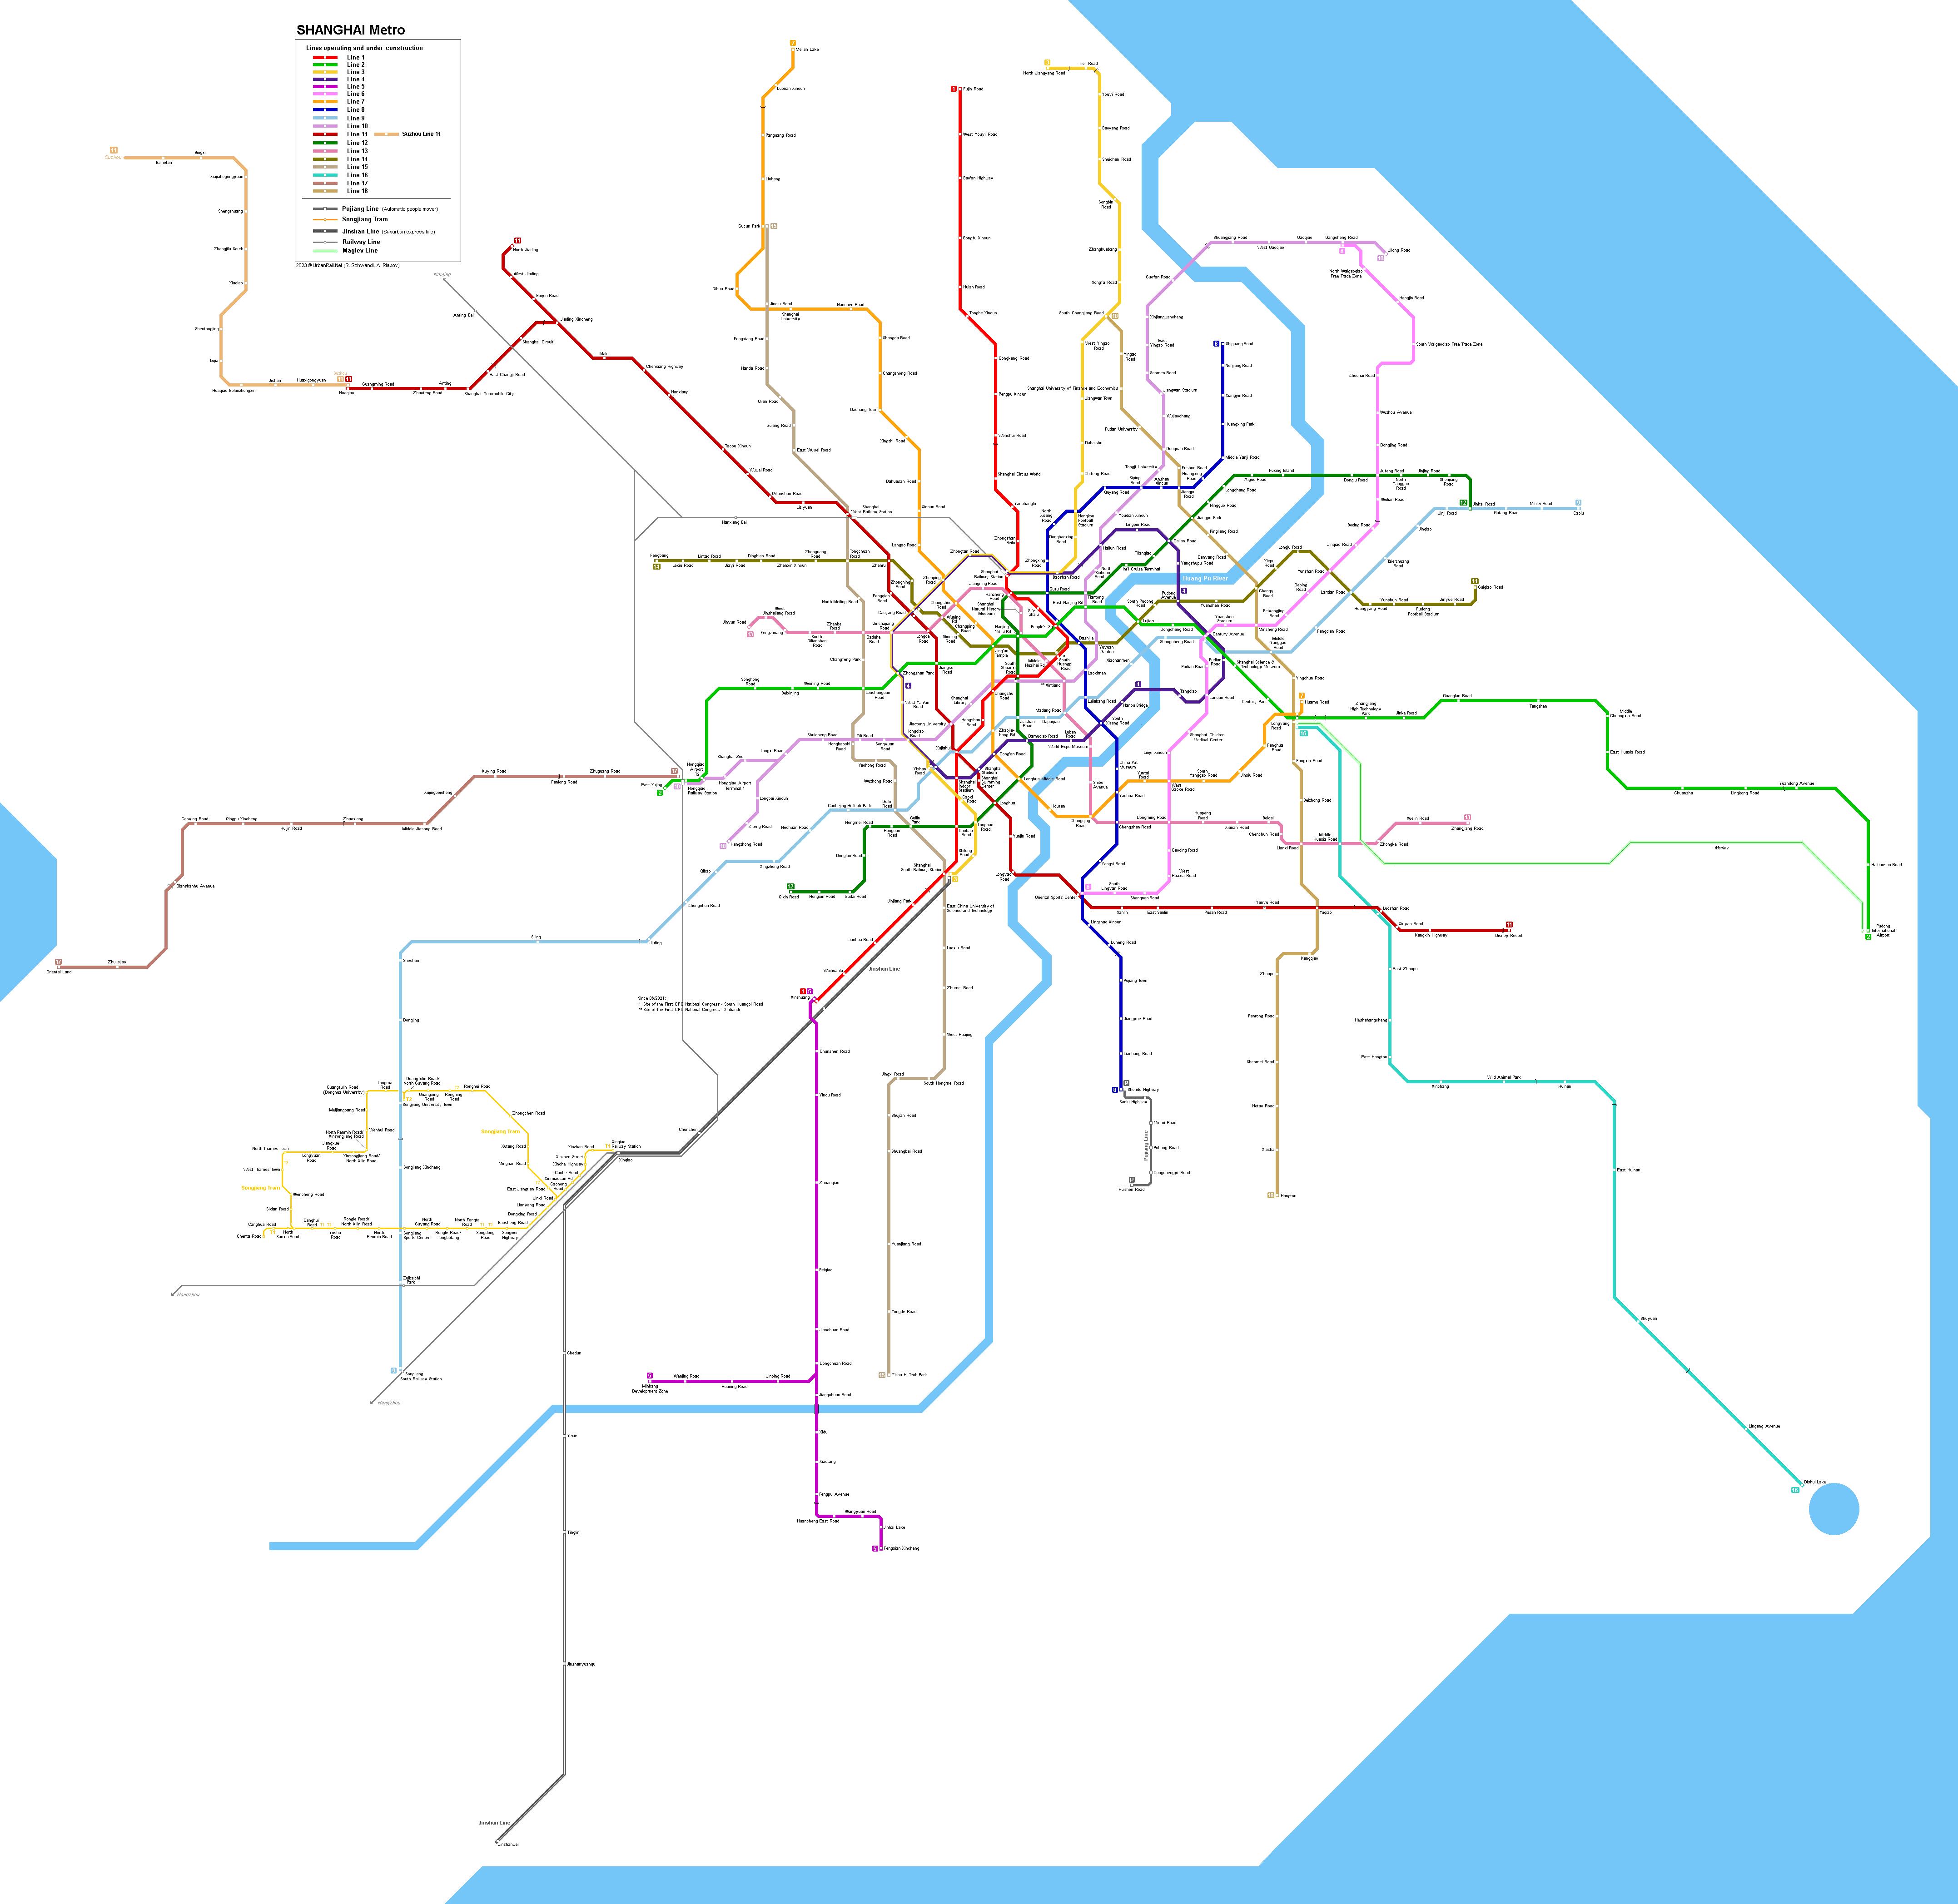 UrbanRailNet China Shanghai Metro Network incl future lines